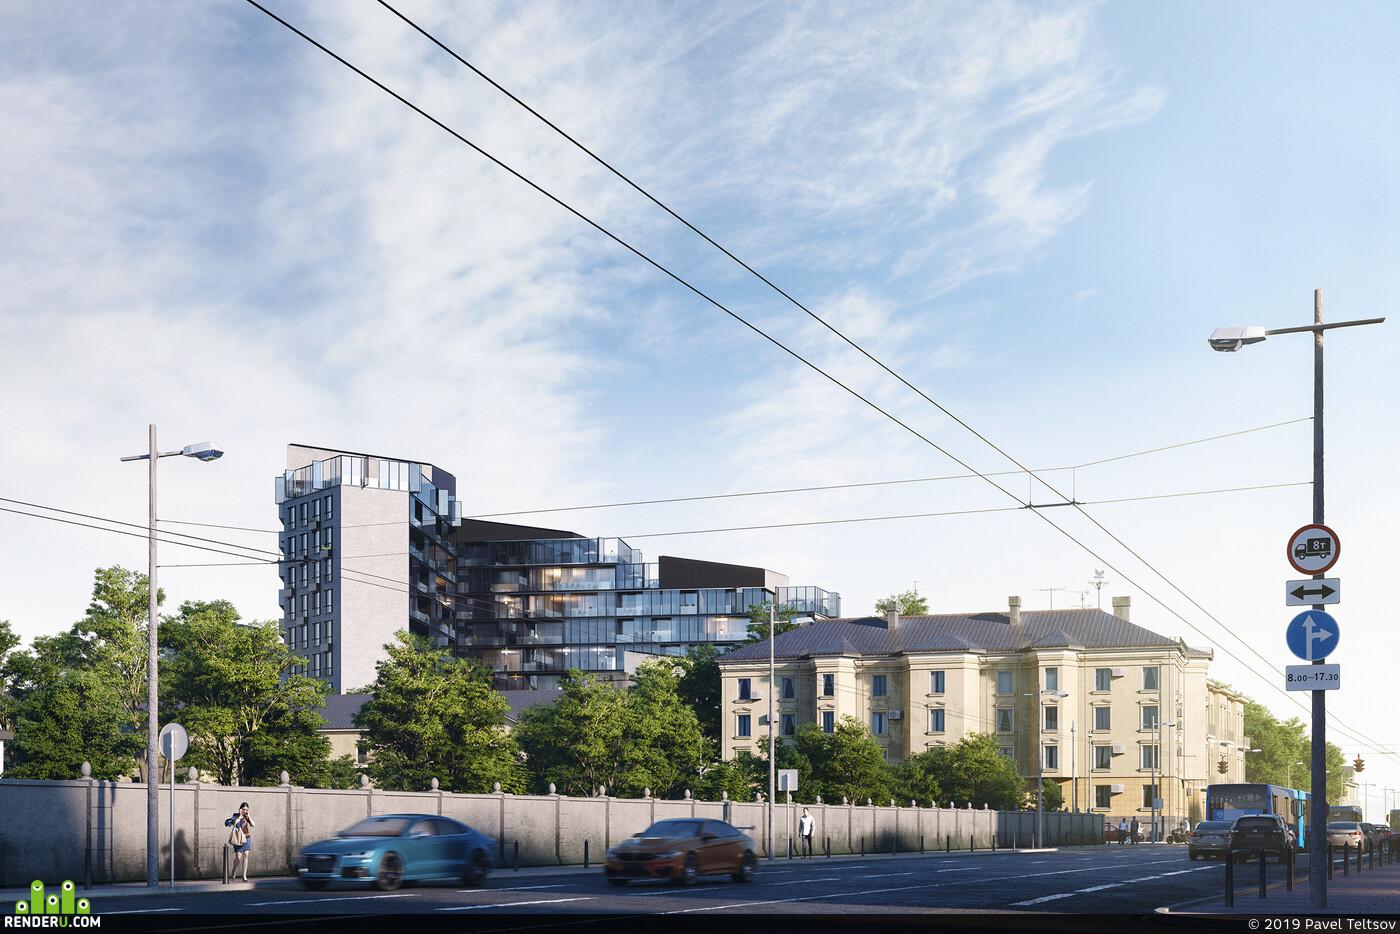 3ds Max, Corona Renderer, Exterior, architecture, 3d, apartments